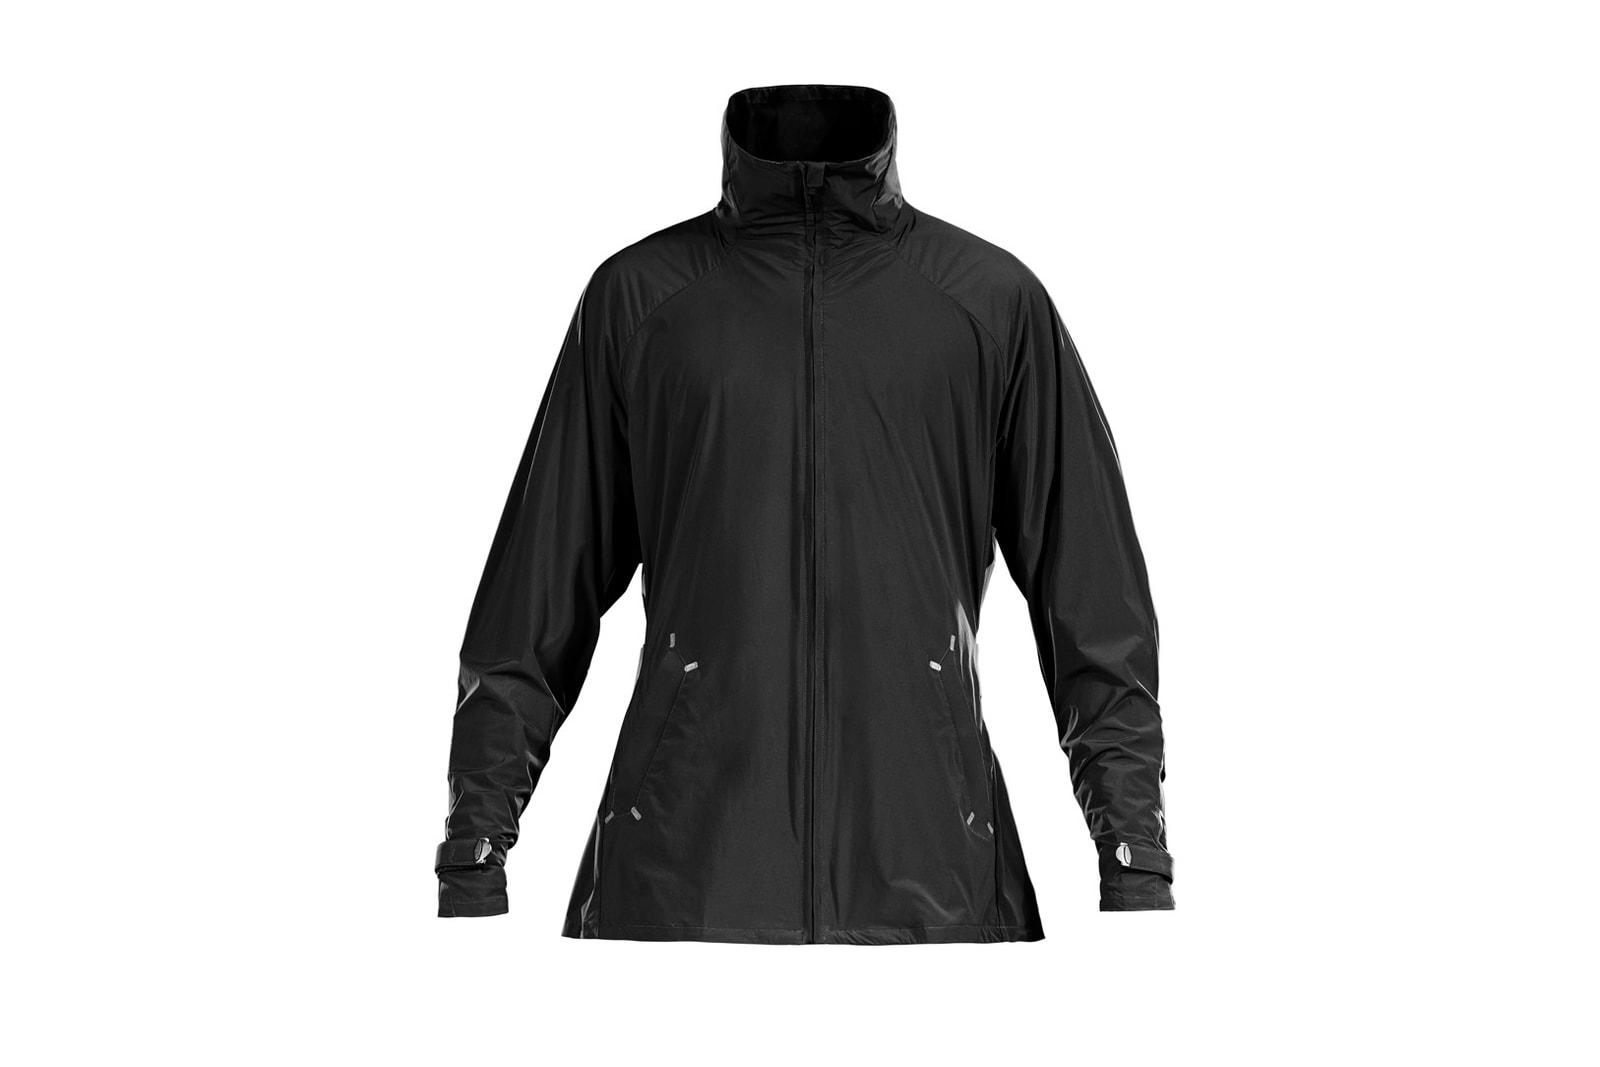 Y-3 SPORT 2017 Spring Summer Collection Approach Merino Rain Zip Jacket Tee Black 3M